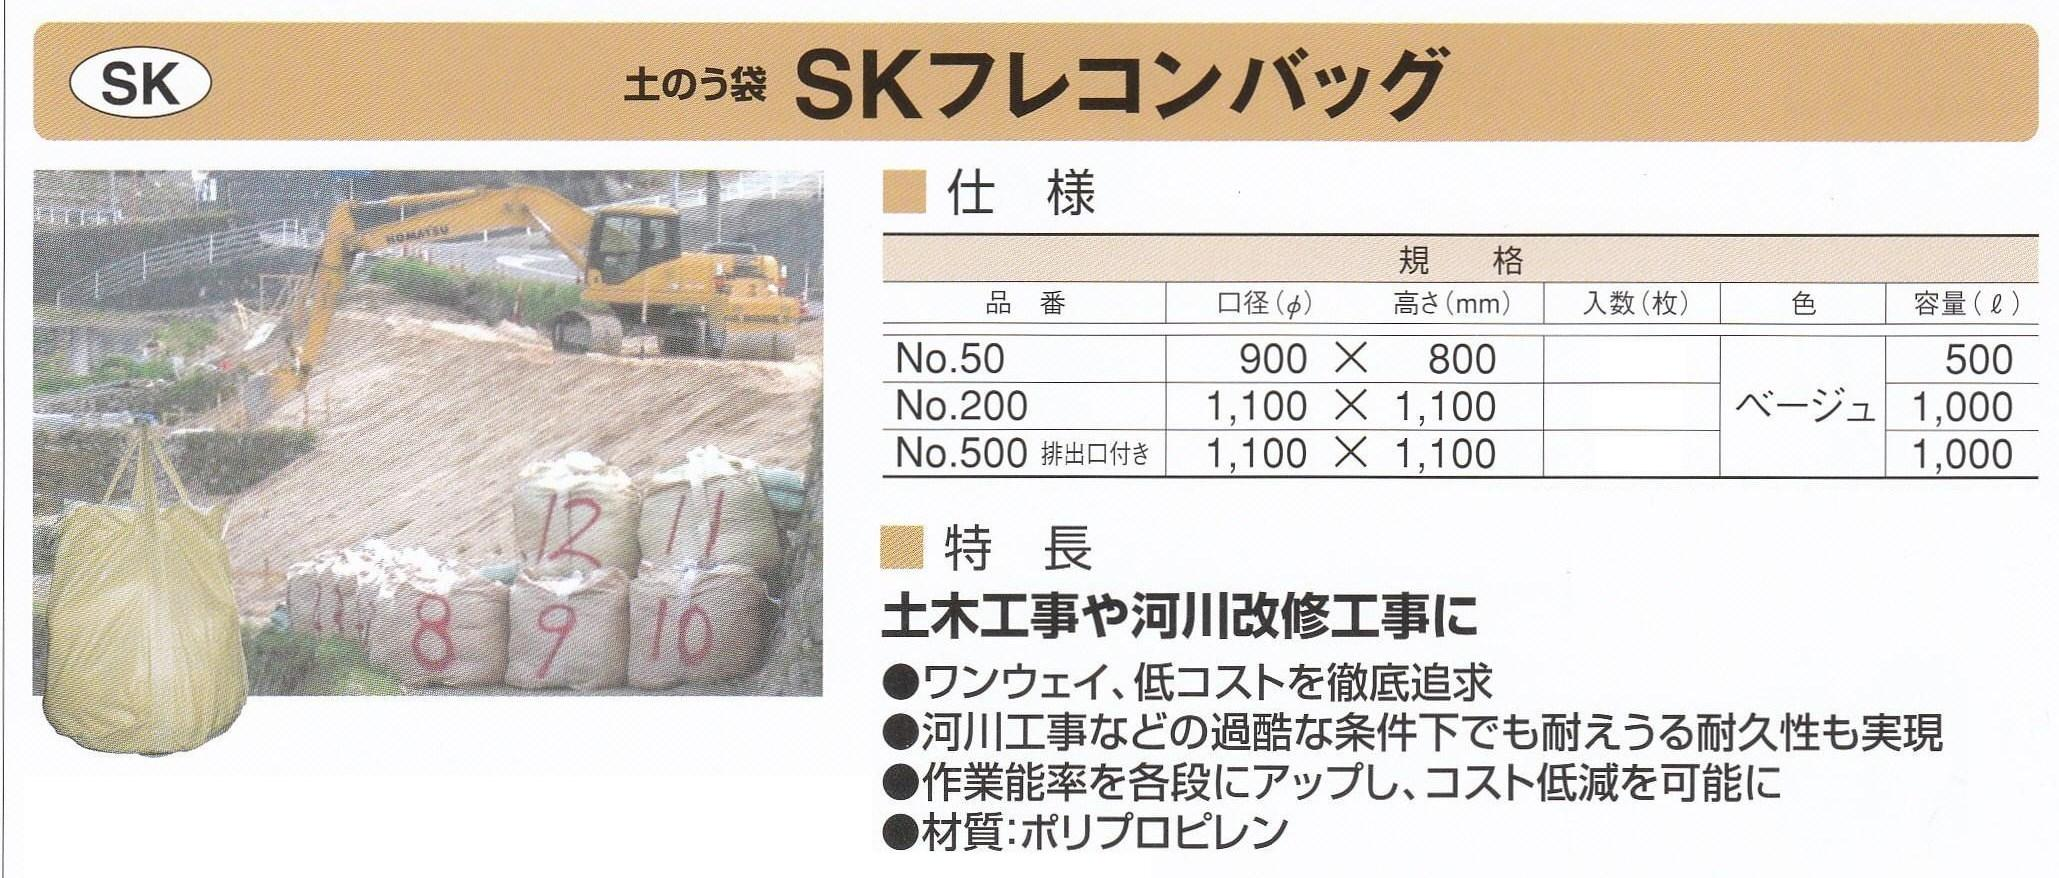 SKフレコンバッグ#500 排出口付 送料無料!(1100パイ×1100mm高さ 30枚/セット)